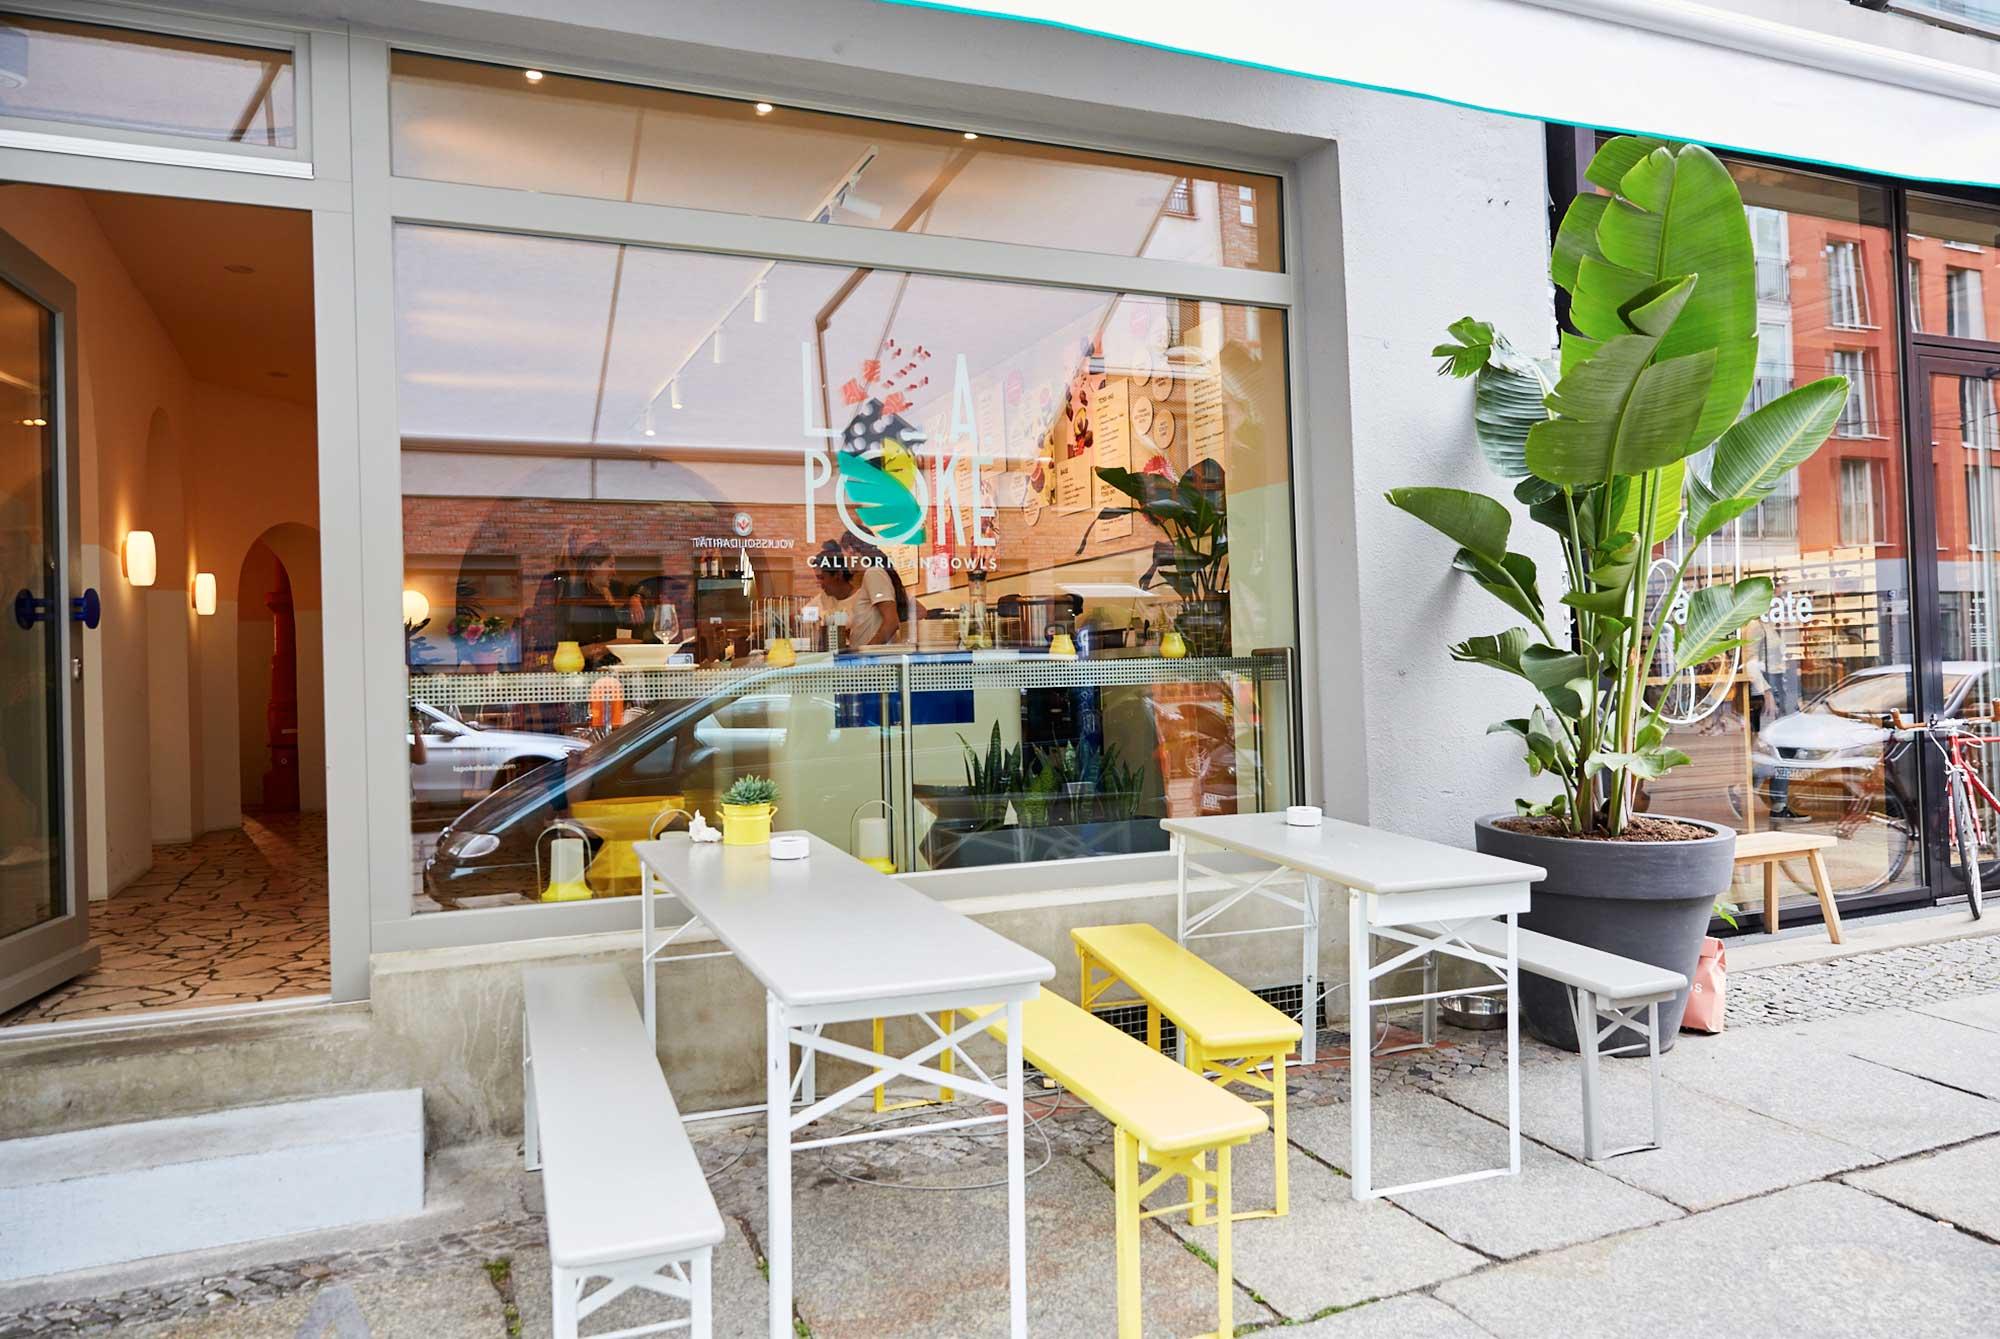 Femtastics-LA-Poke-Berlin-Restaurant